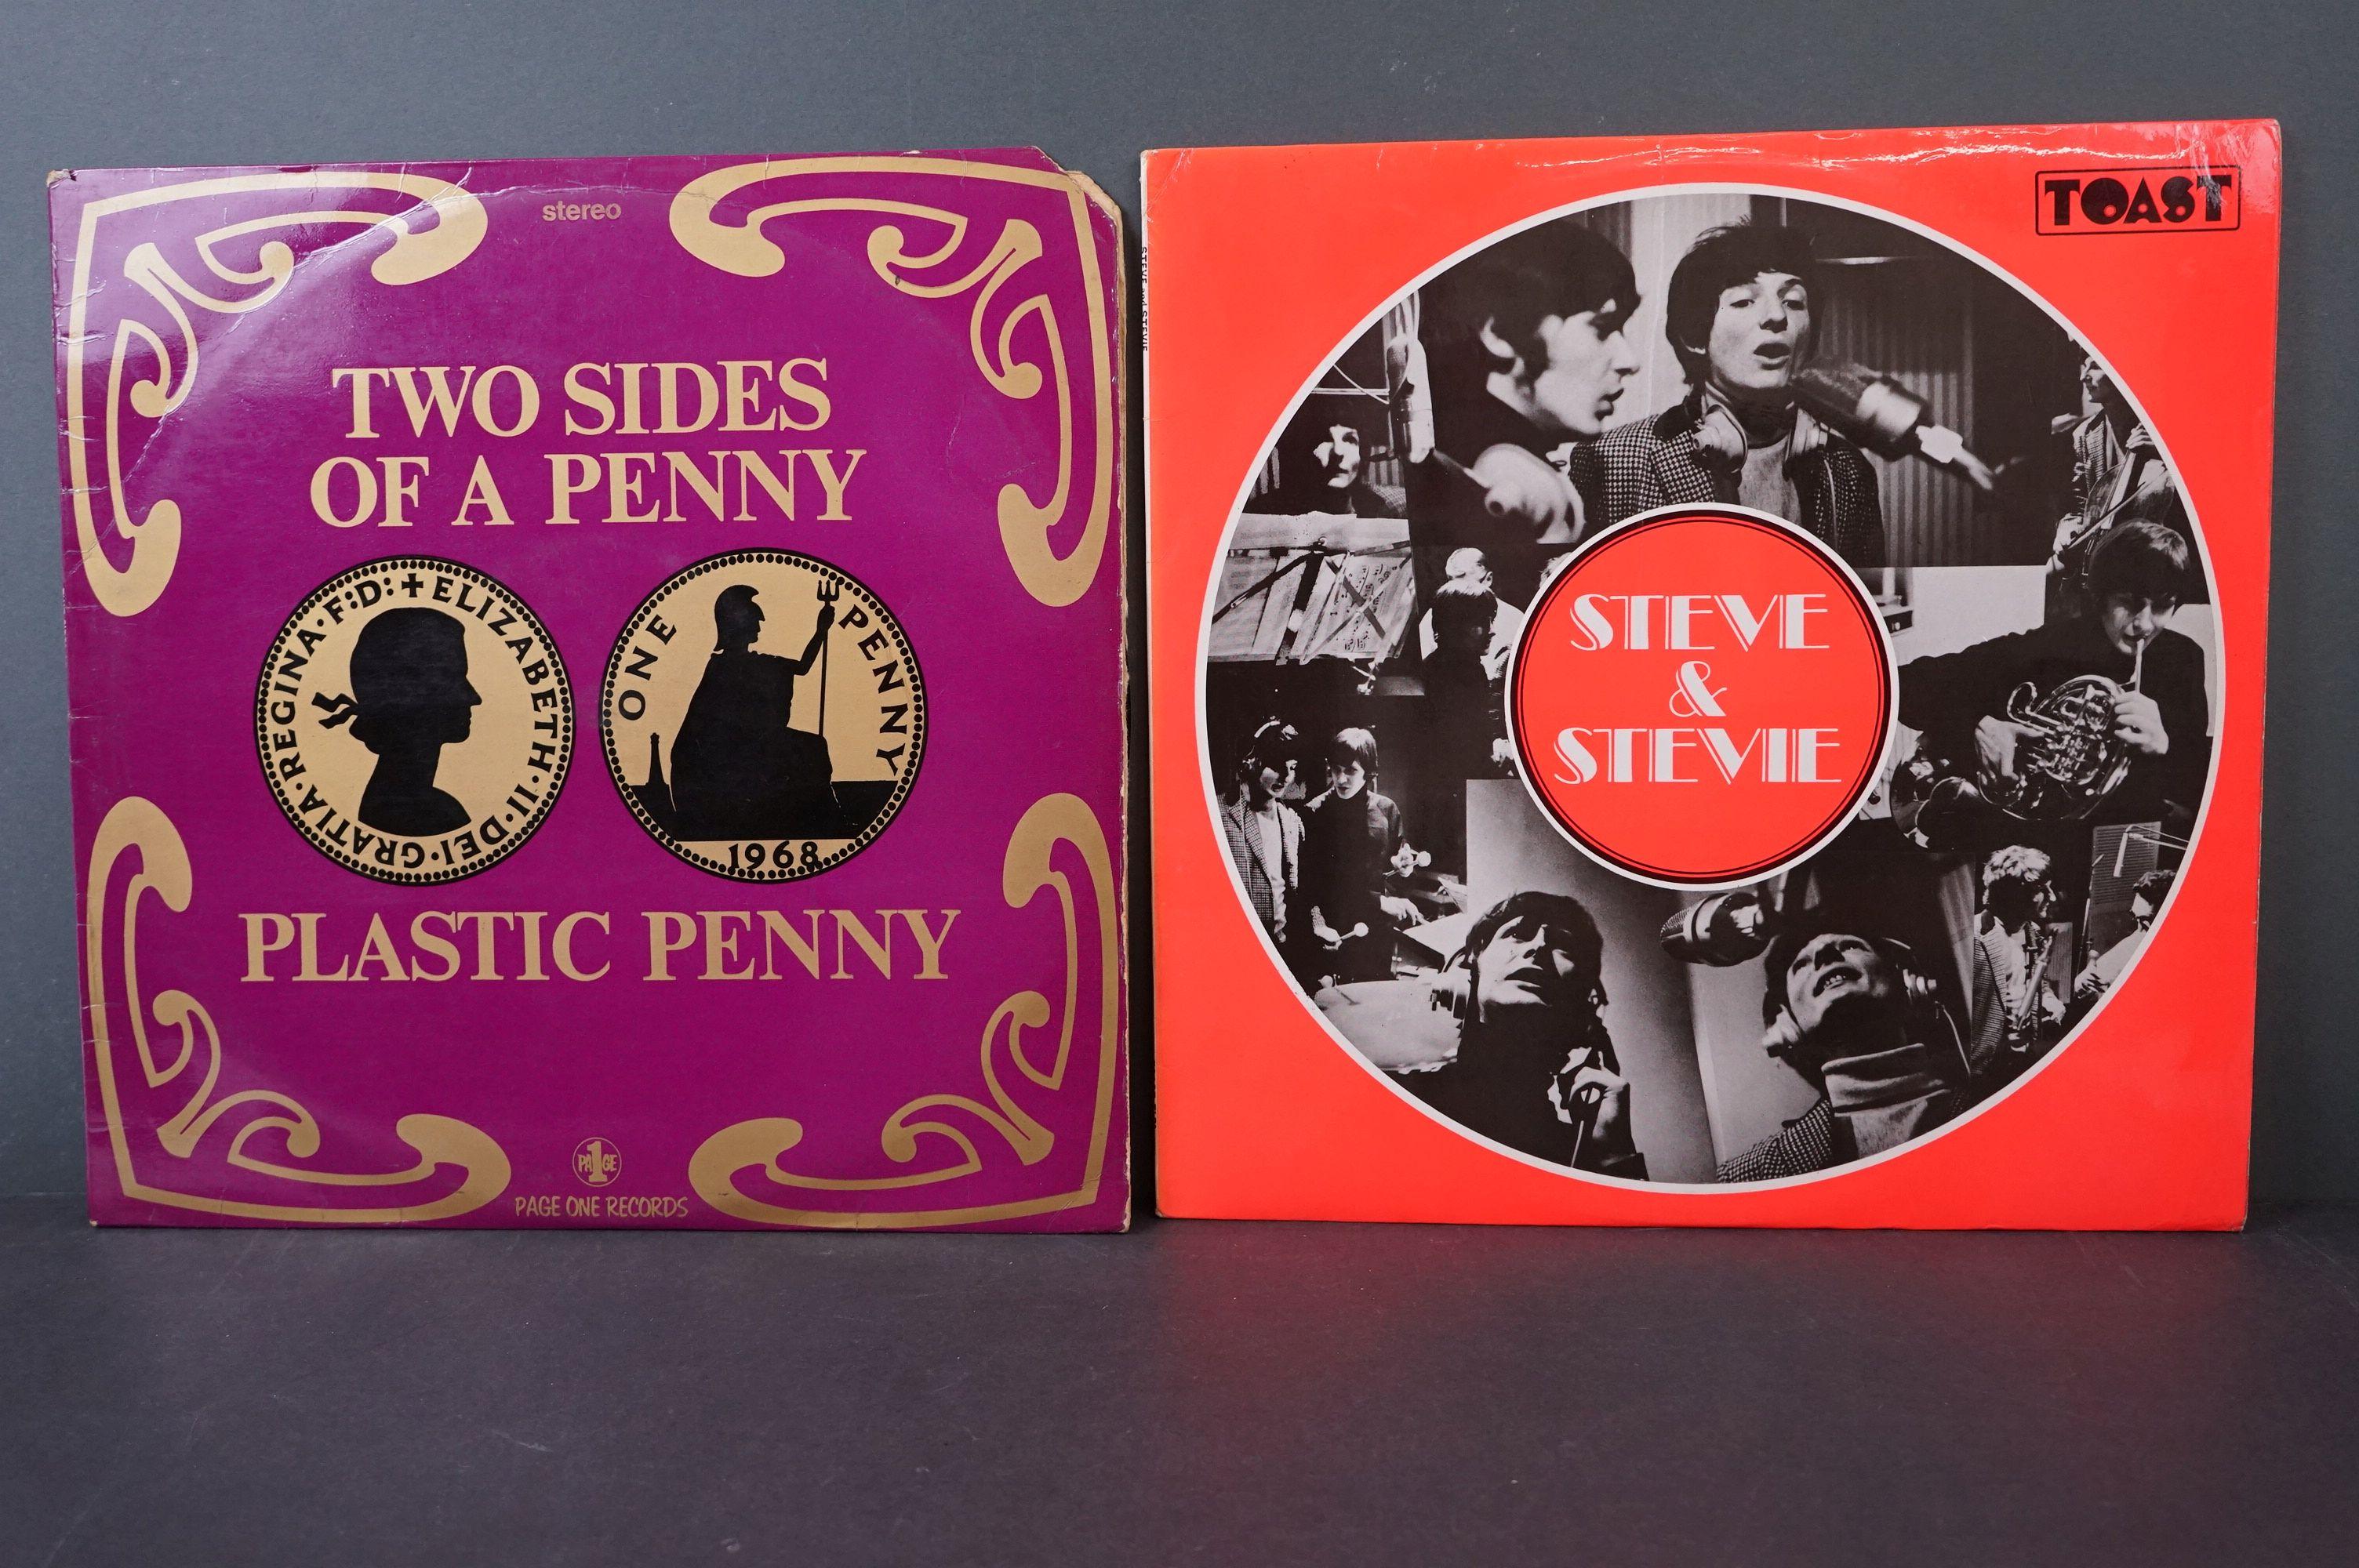 Vinyl - Psych - Two scarce original UK pressing Psych albums to include Steve & Stevie - Steve &